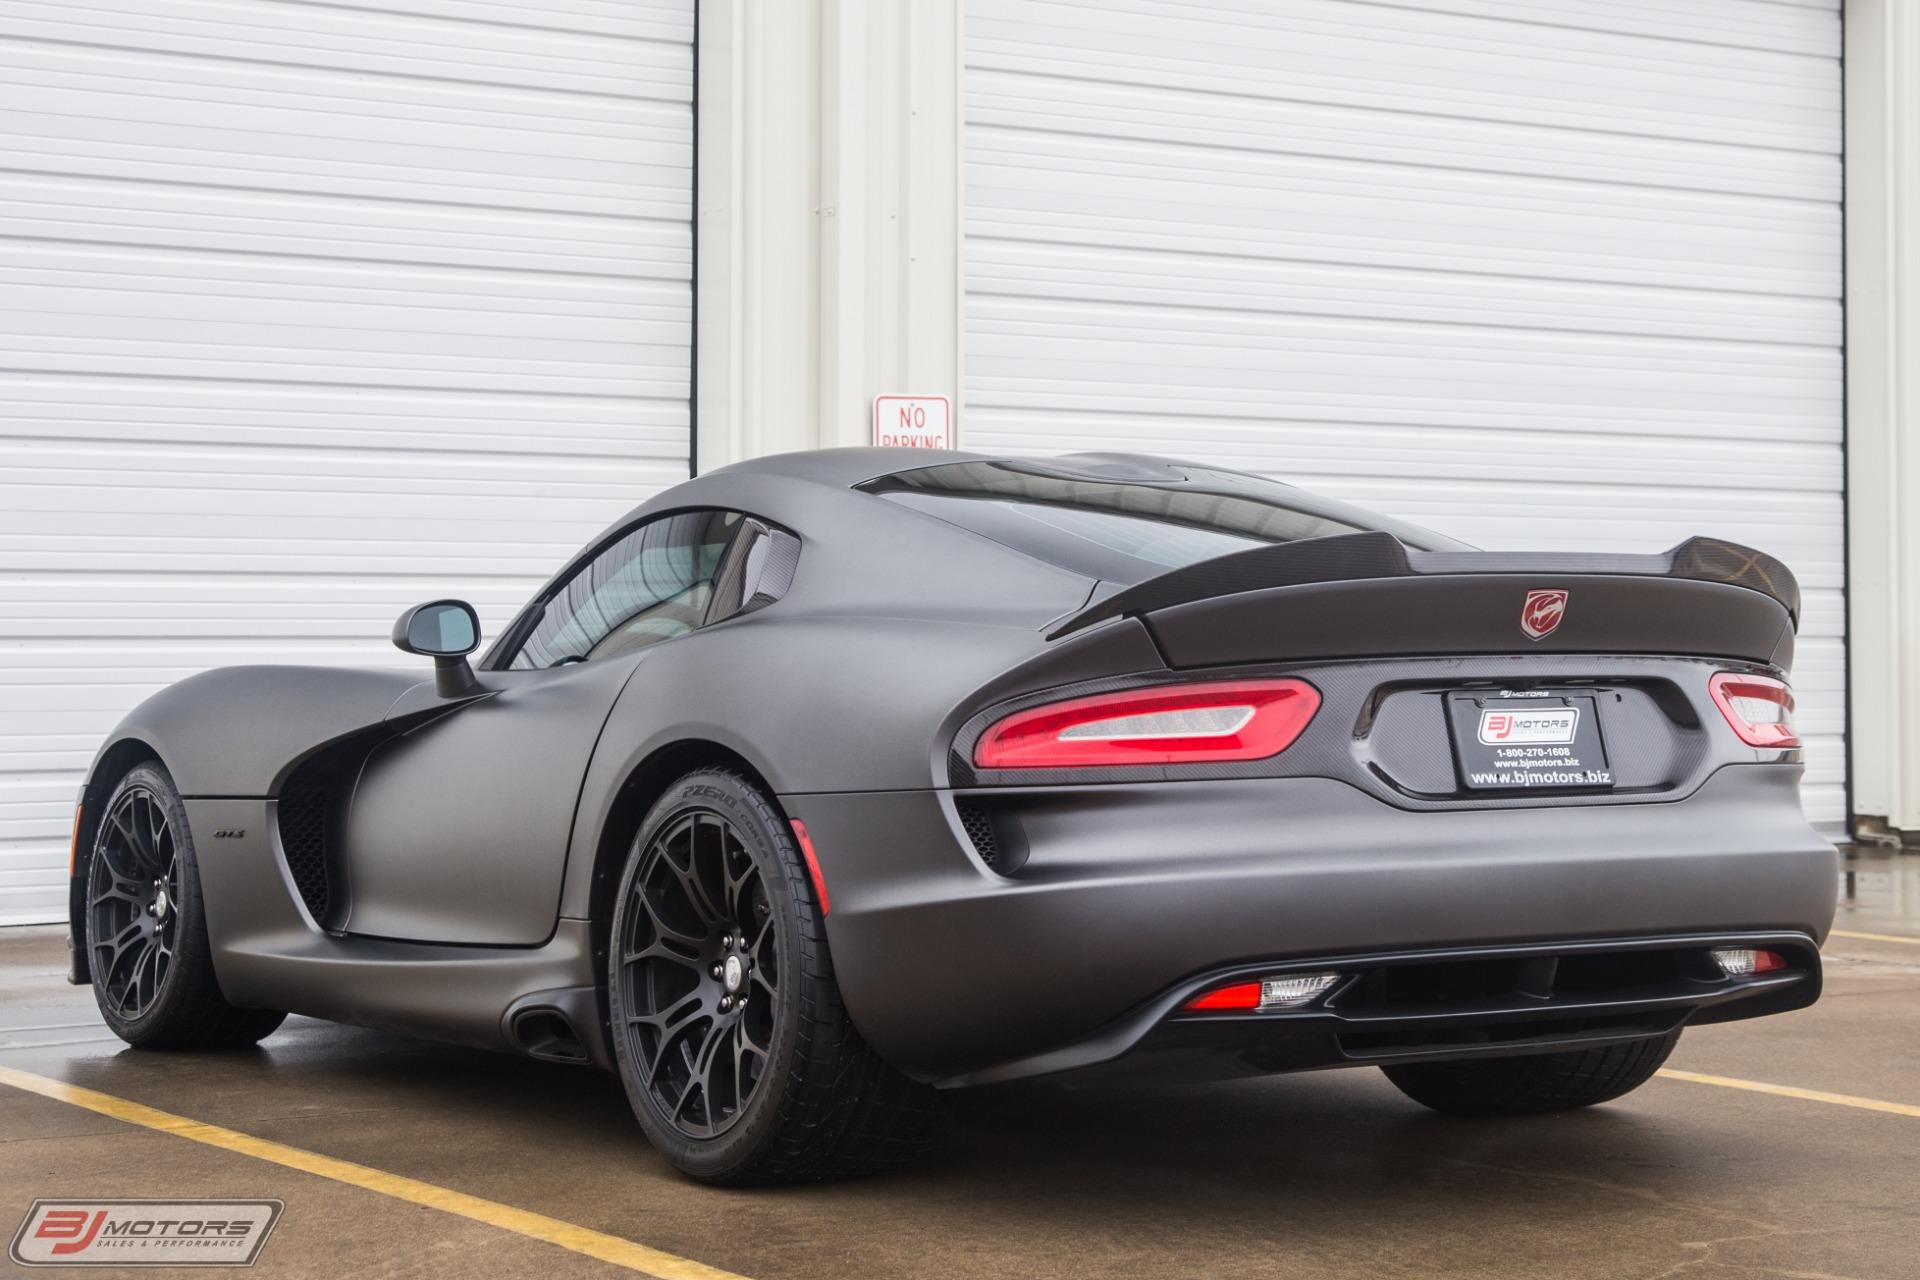 New-2014-Dodge-Viper-GTS